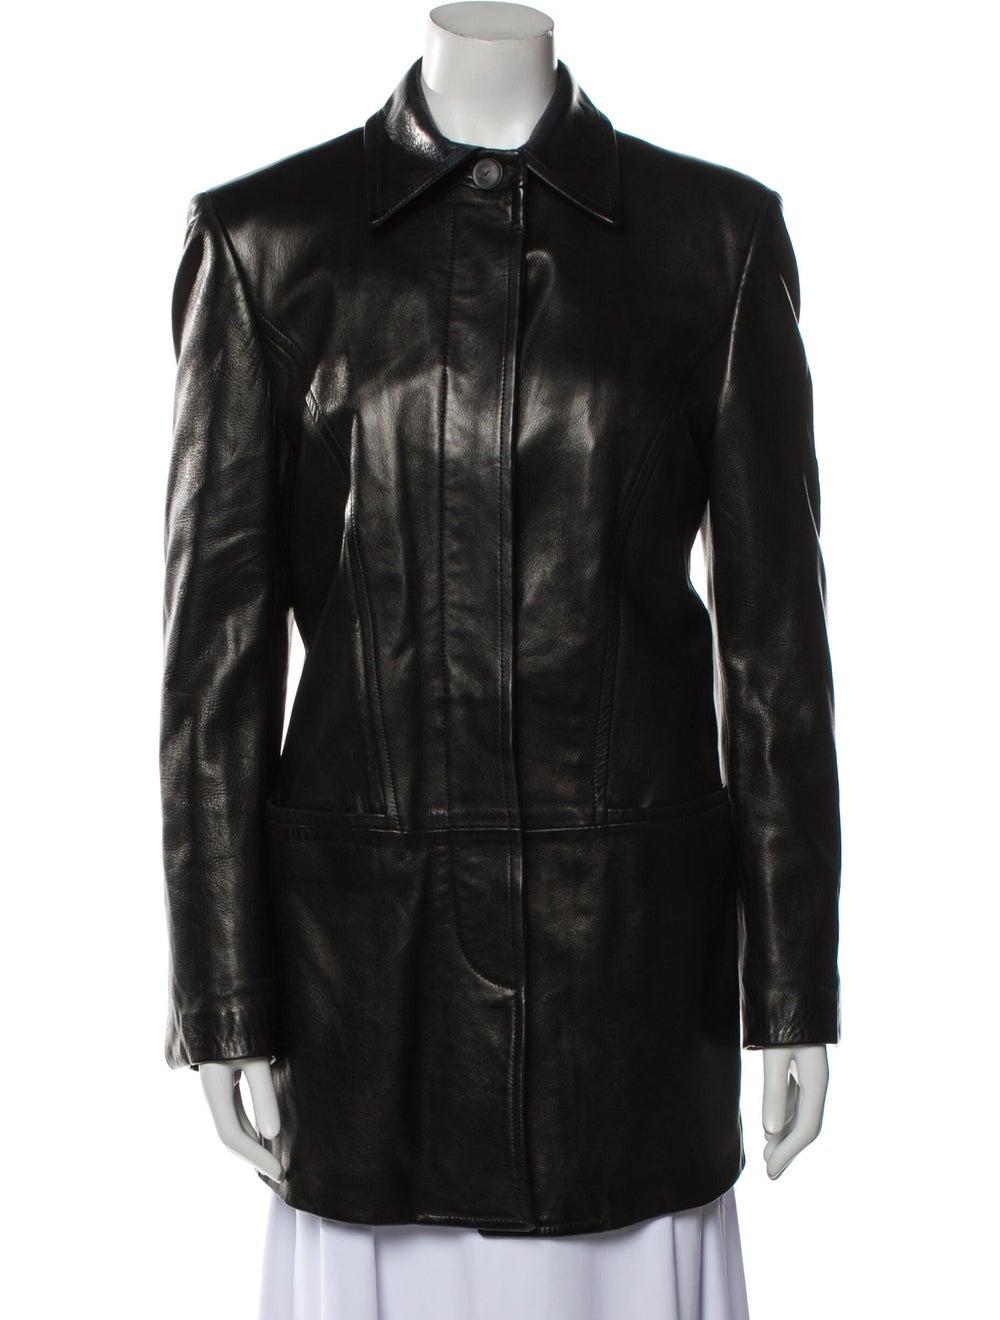 Gucci Vintage 1990's Trench Coat Black - image 1